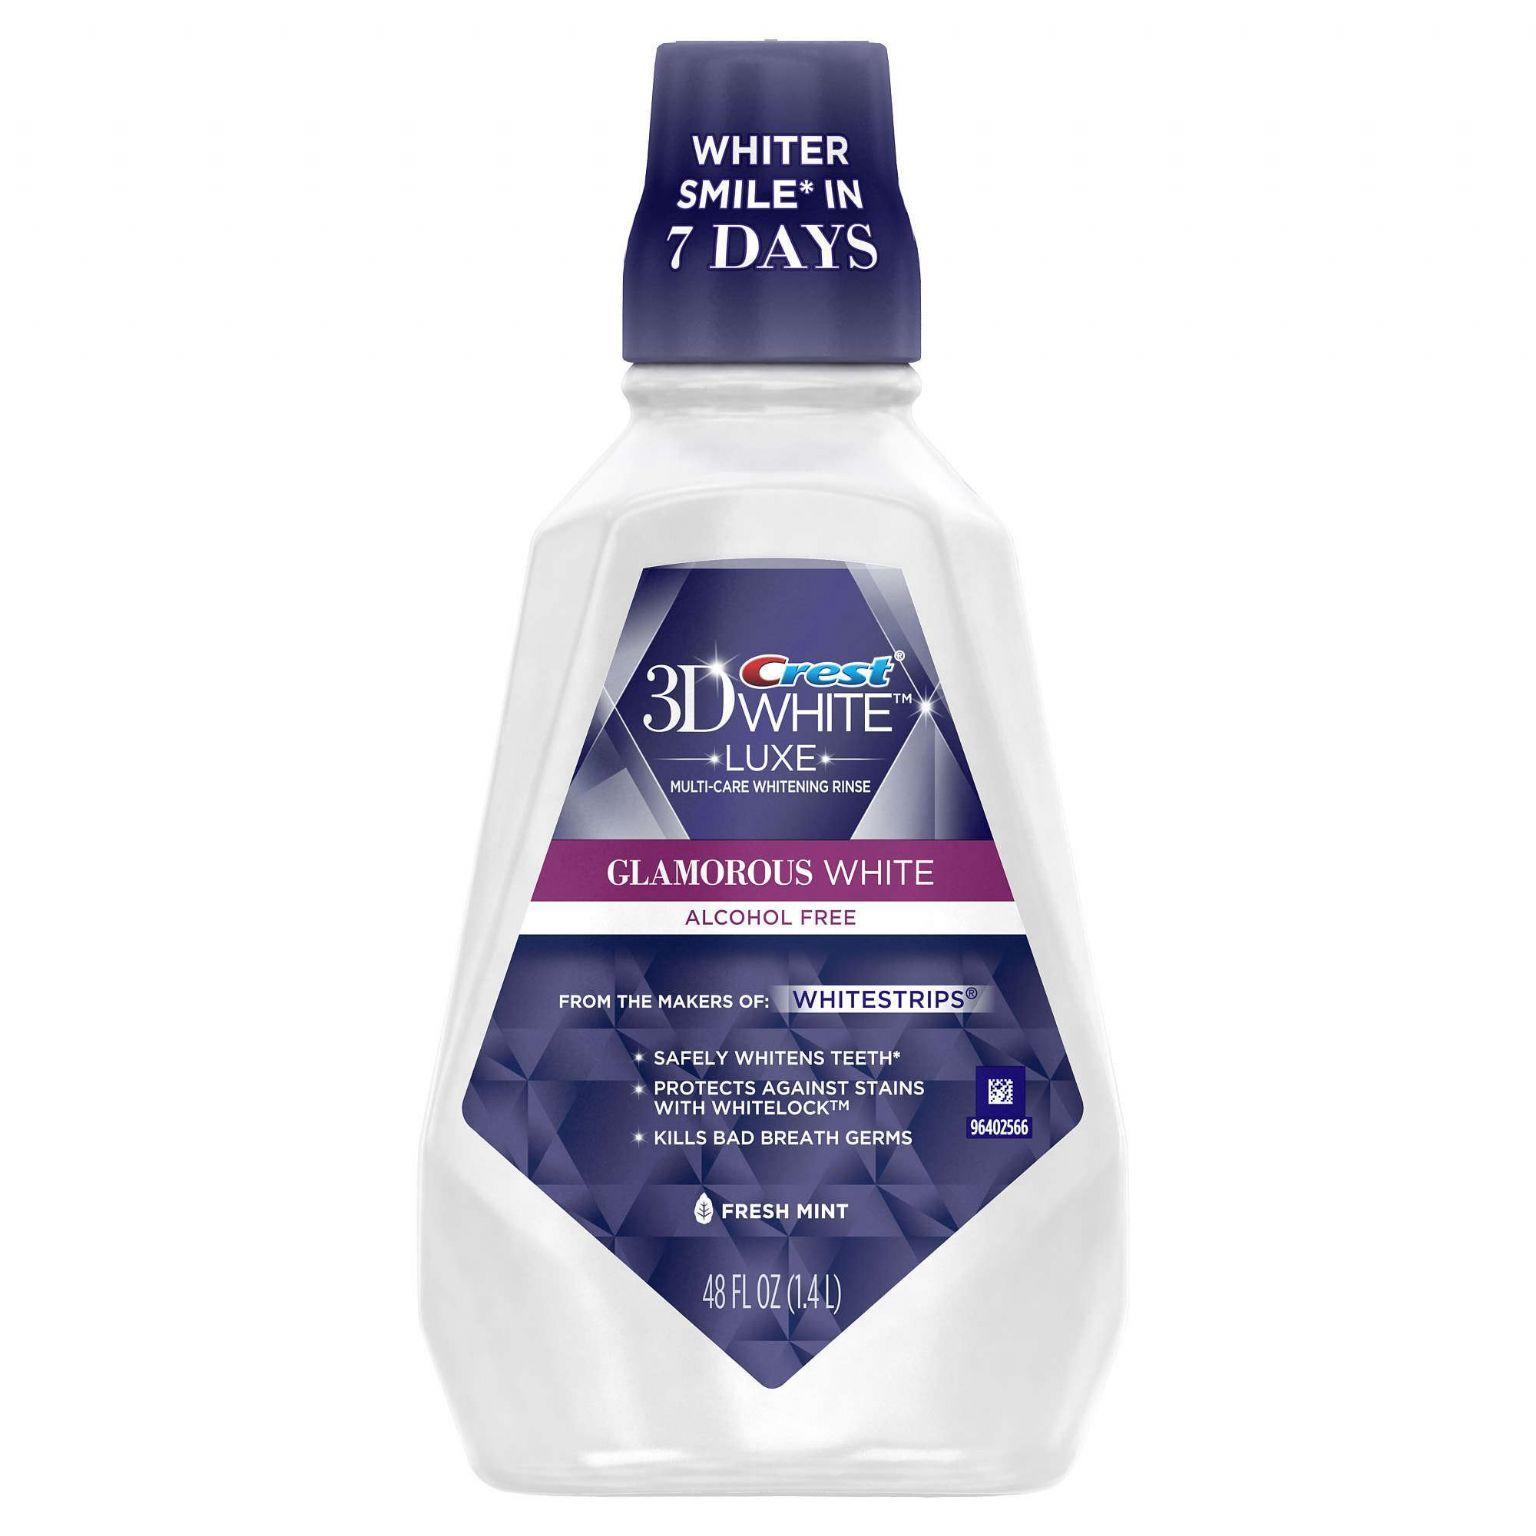 3D White Glamorous White Multi-Care Whitening Mouthwash